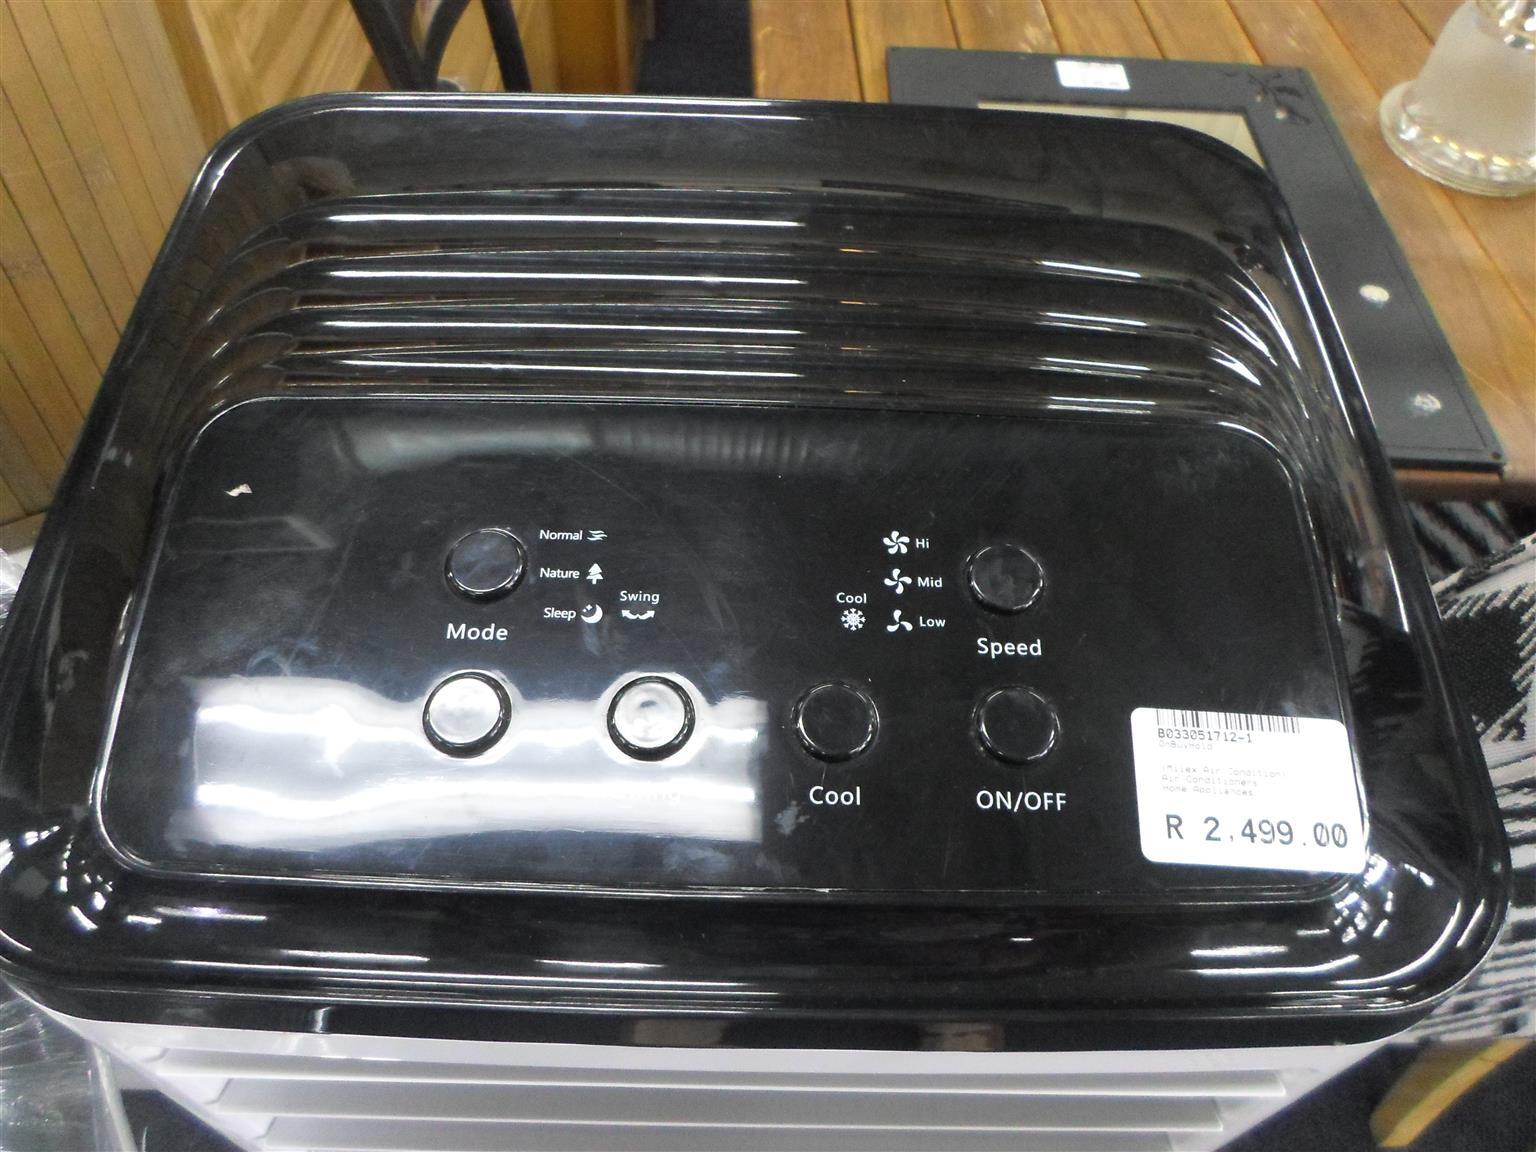 15l Milex Air Cooler - B033051712-1